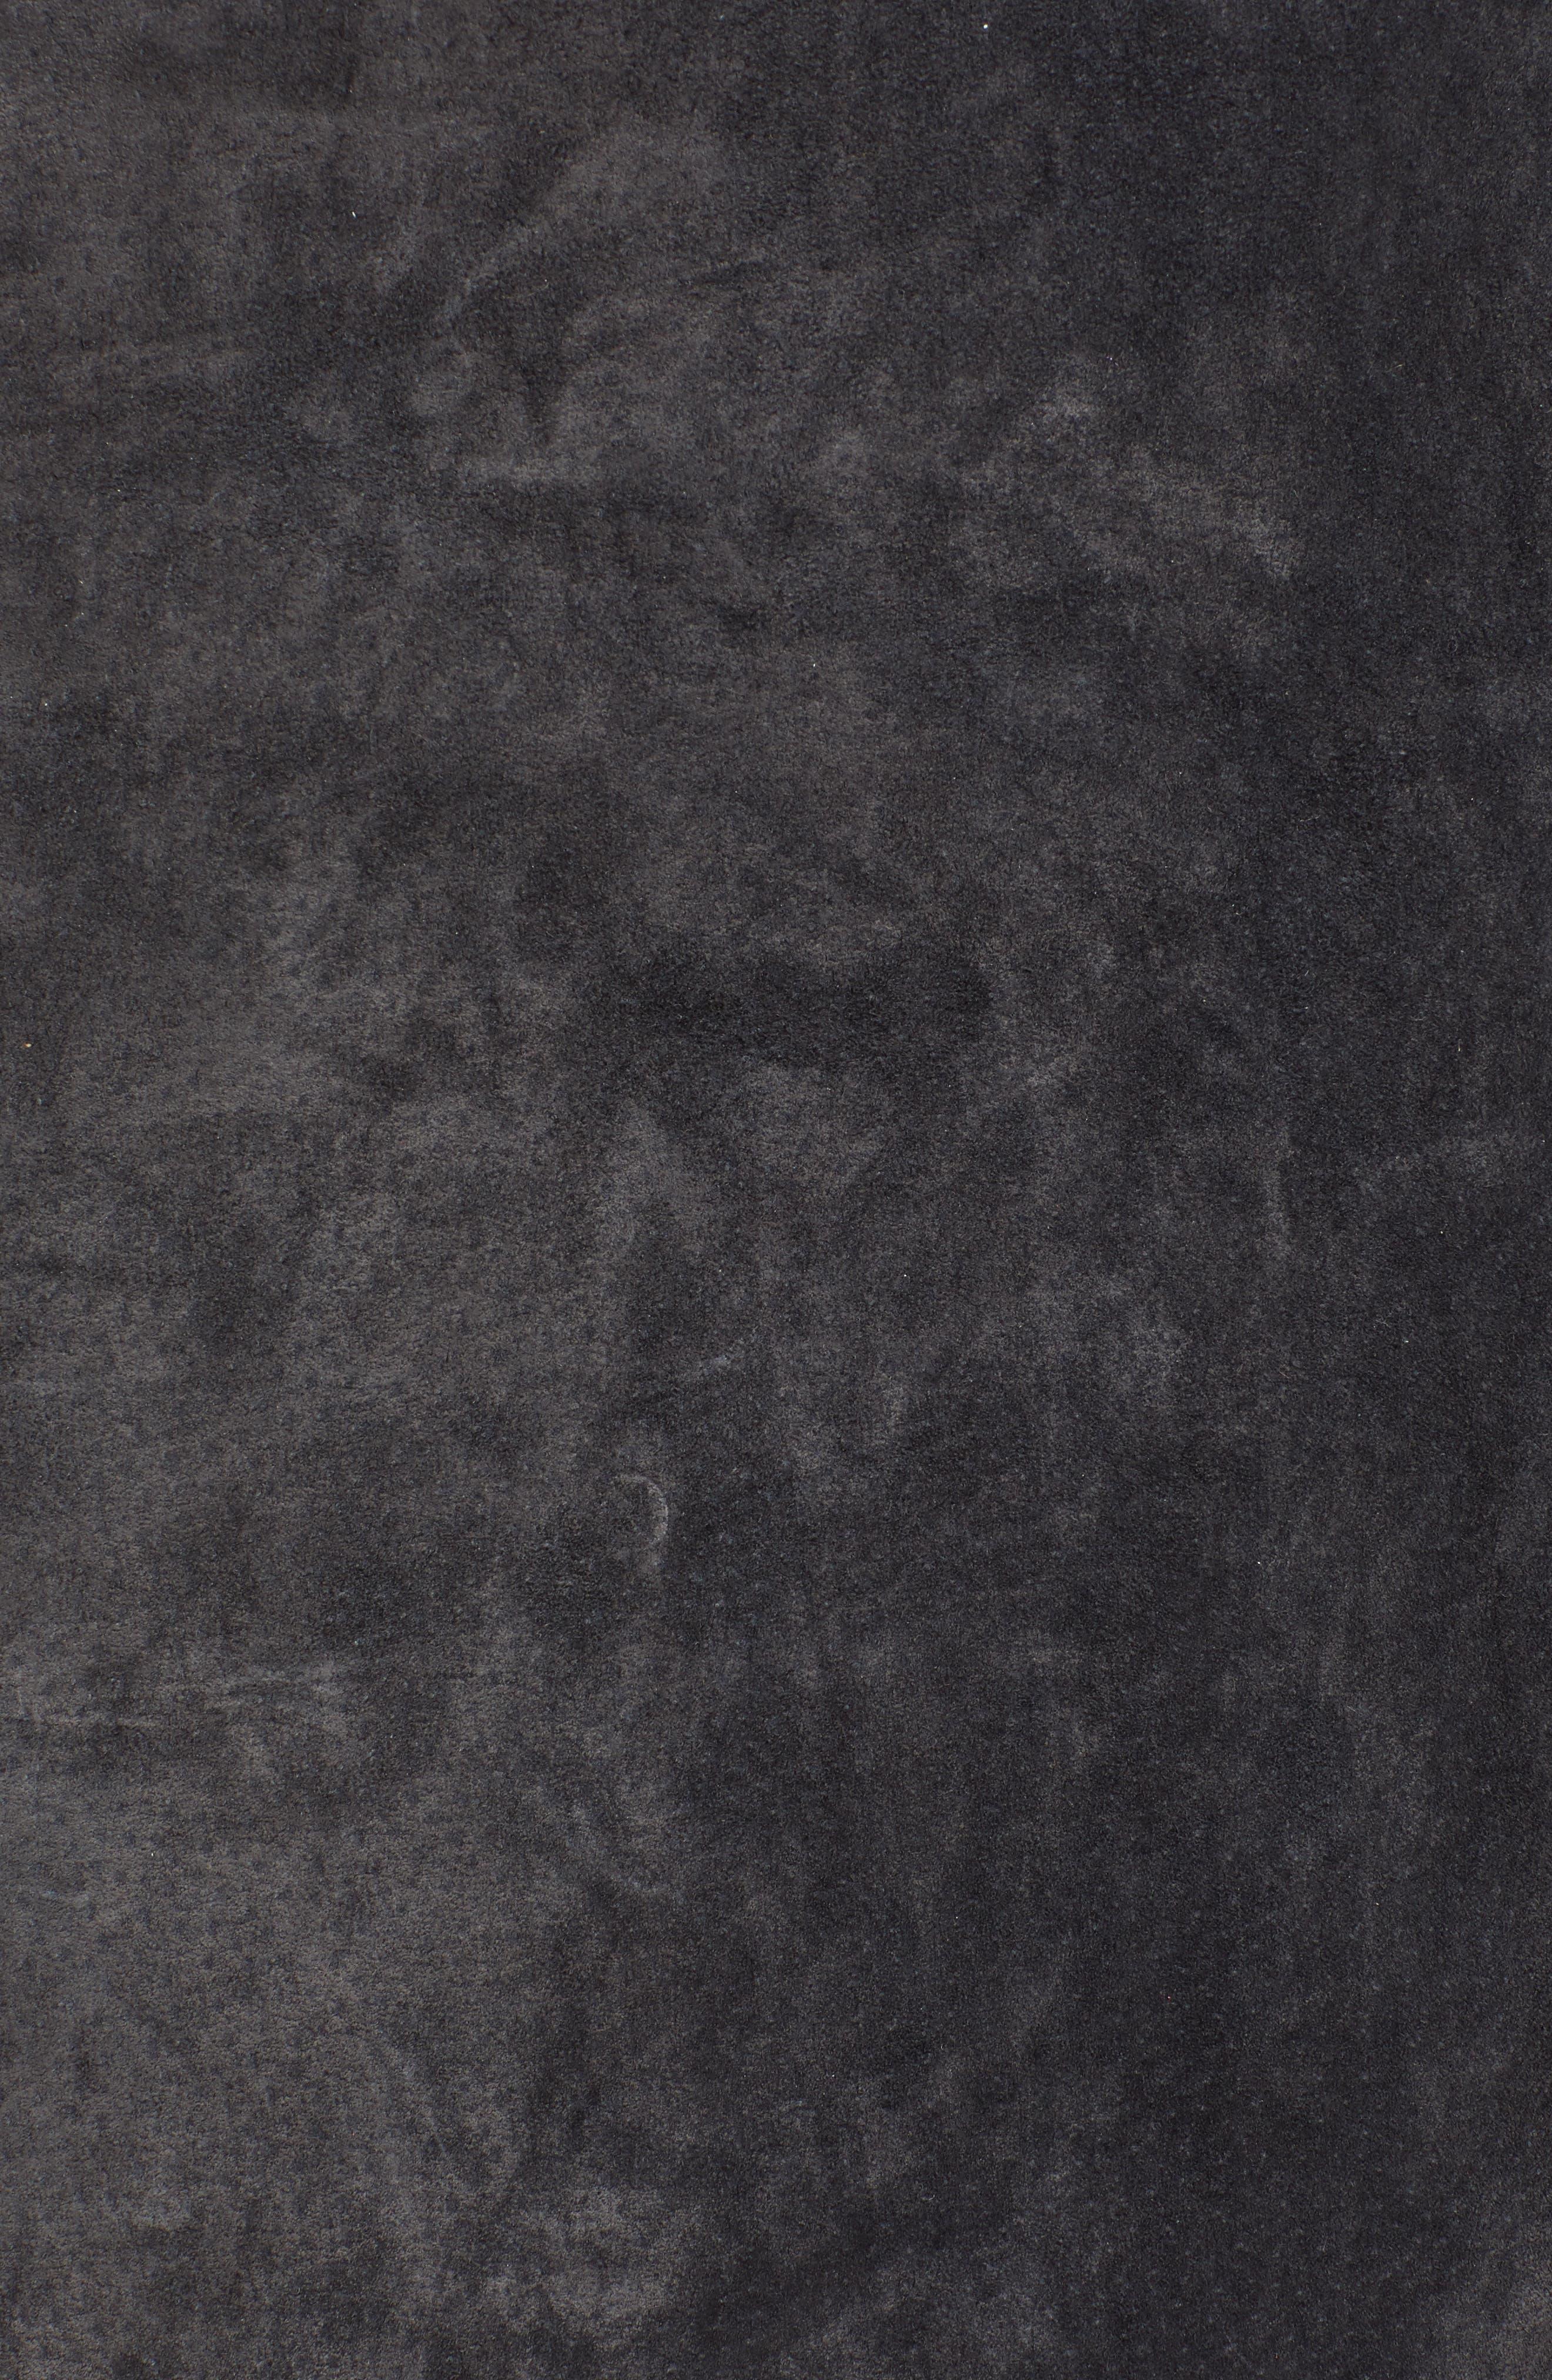 A-Line Suede Miniskirt,                             Alternate thumbnail 5, color,                             020